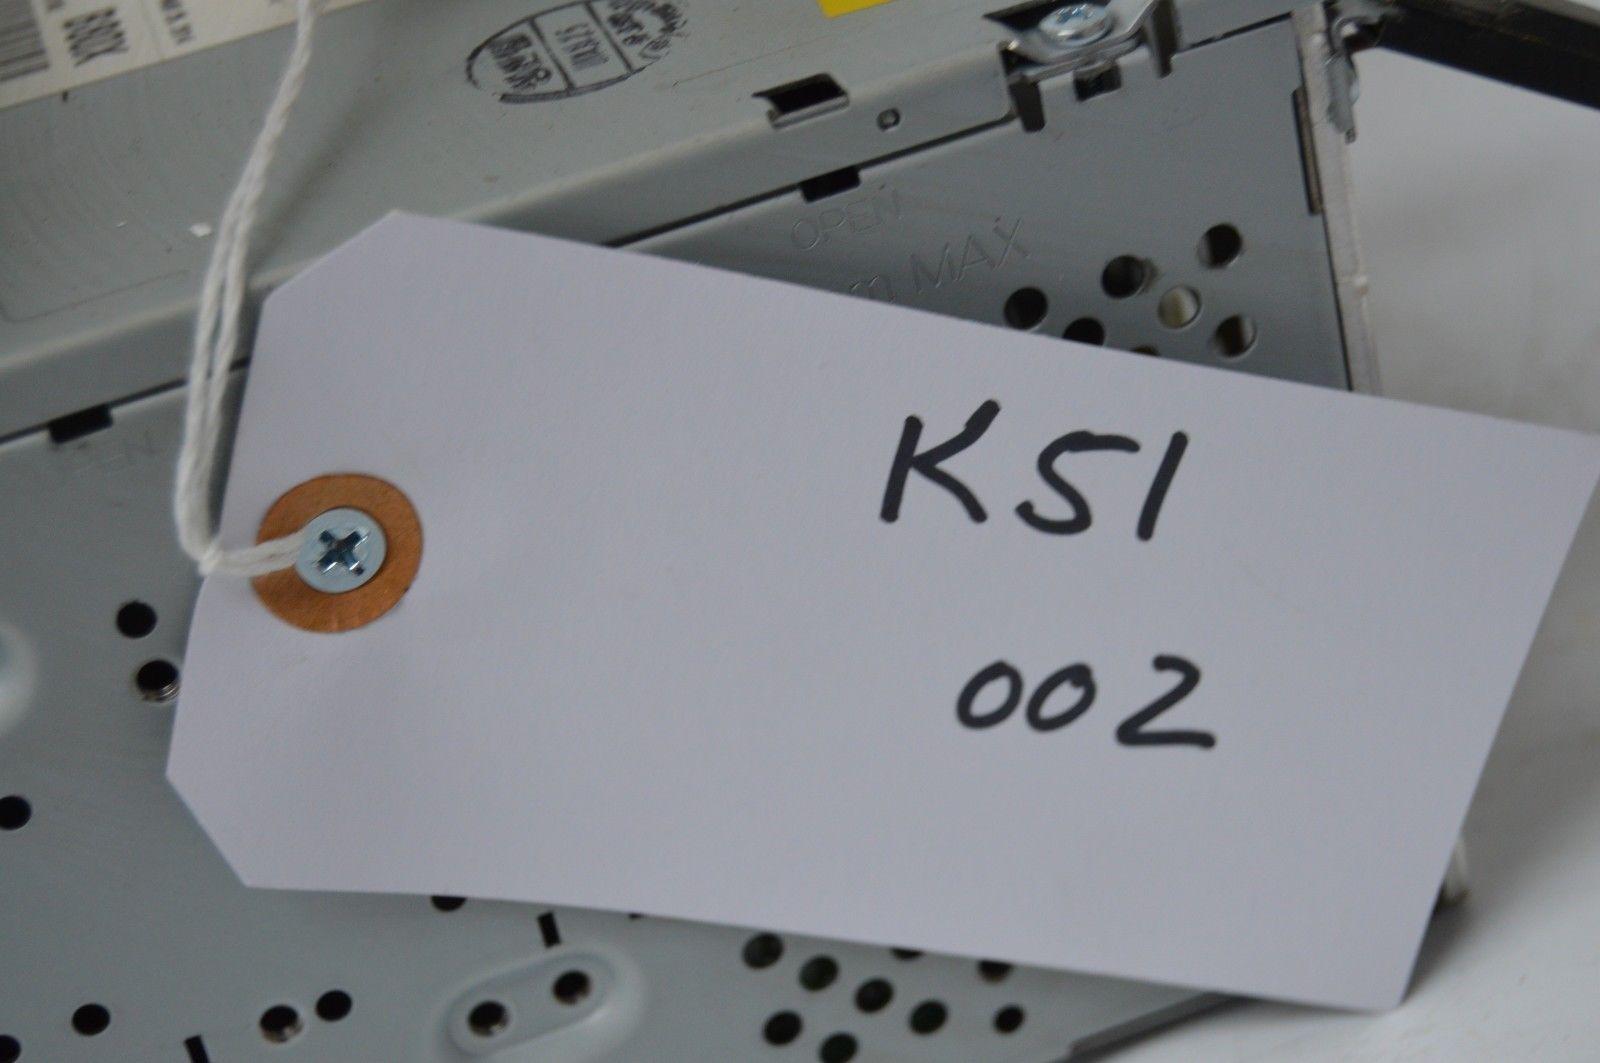 2014 HYUNDAI AZERA RADIO CD PLAYER OEM RADIO 96170-3V8004X TESTED K51#002